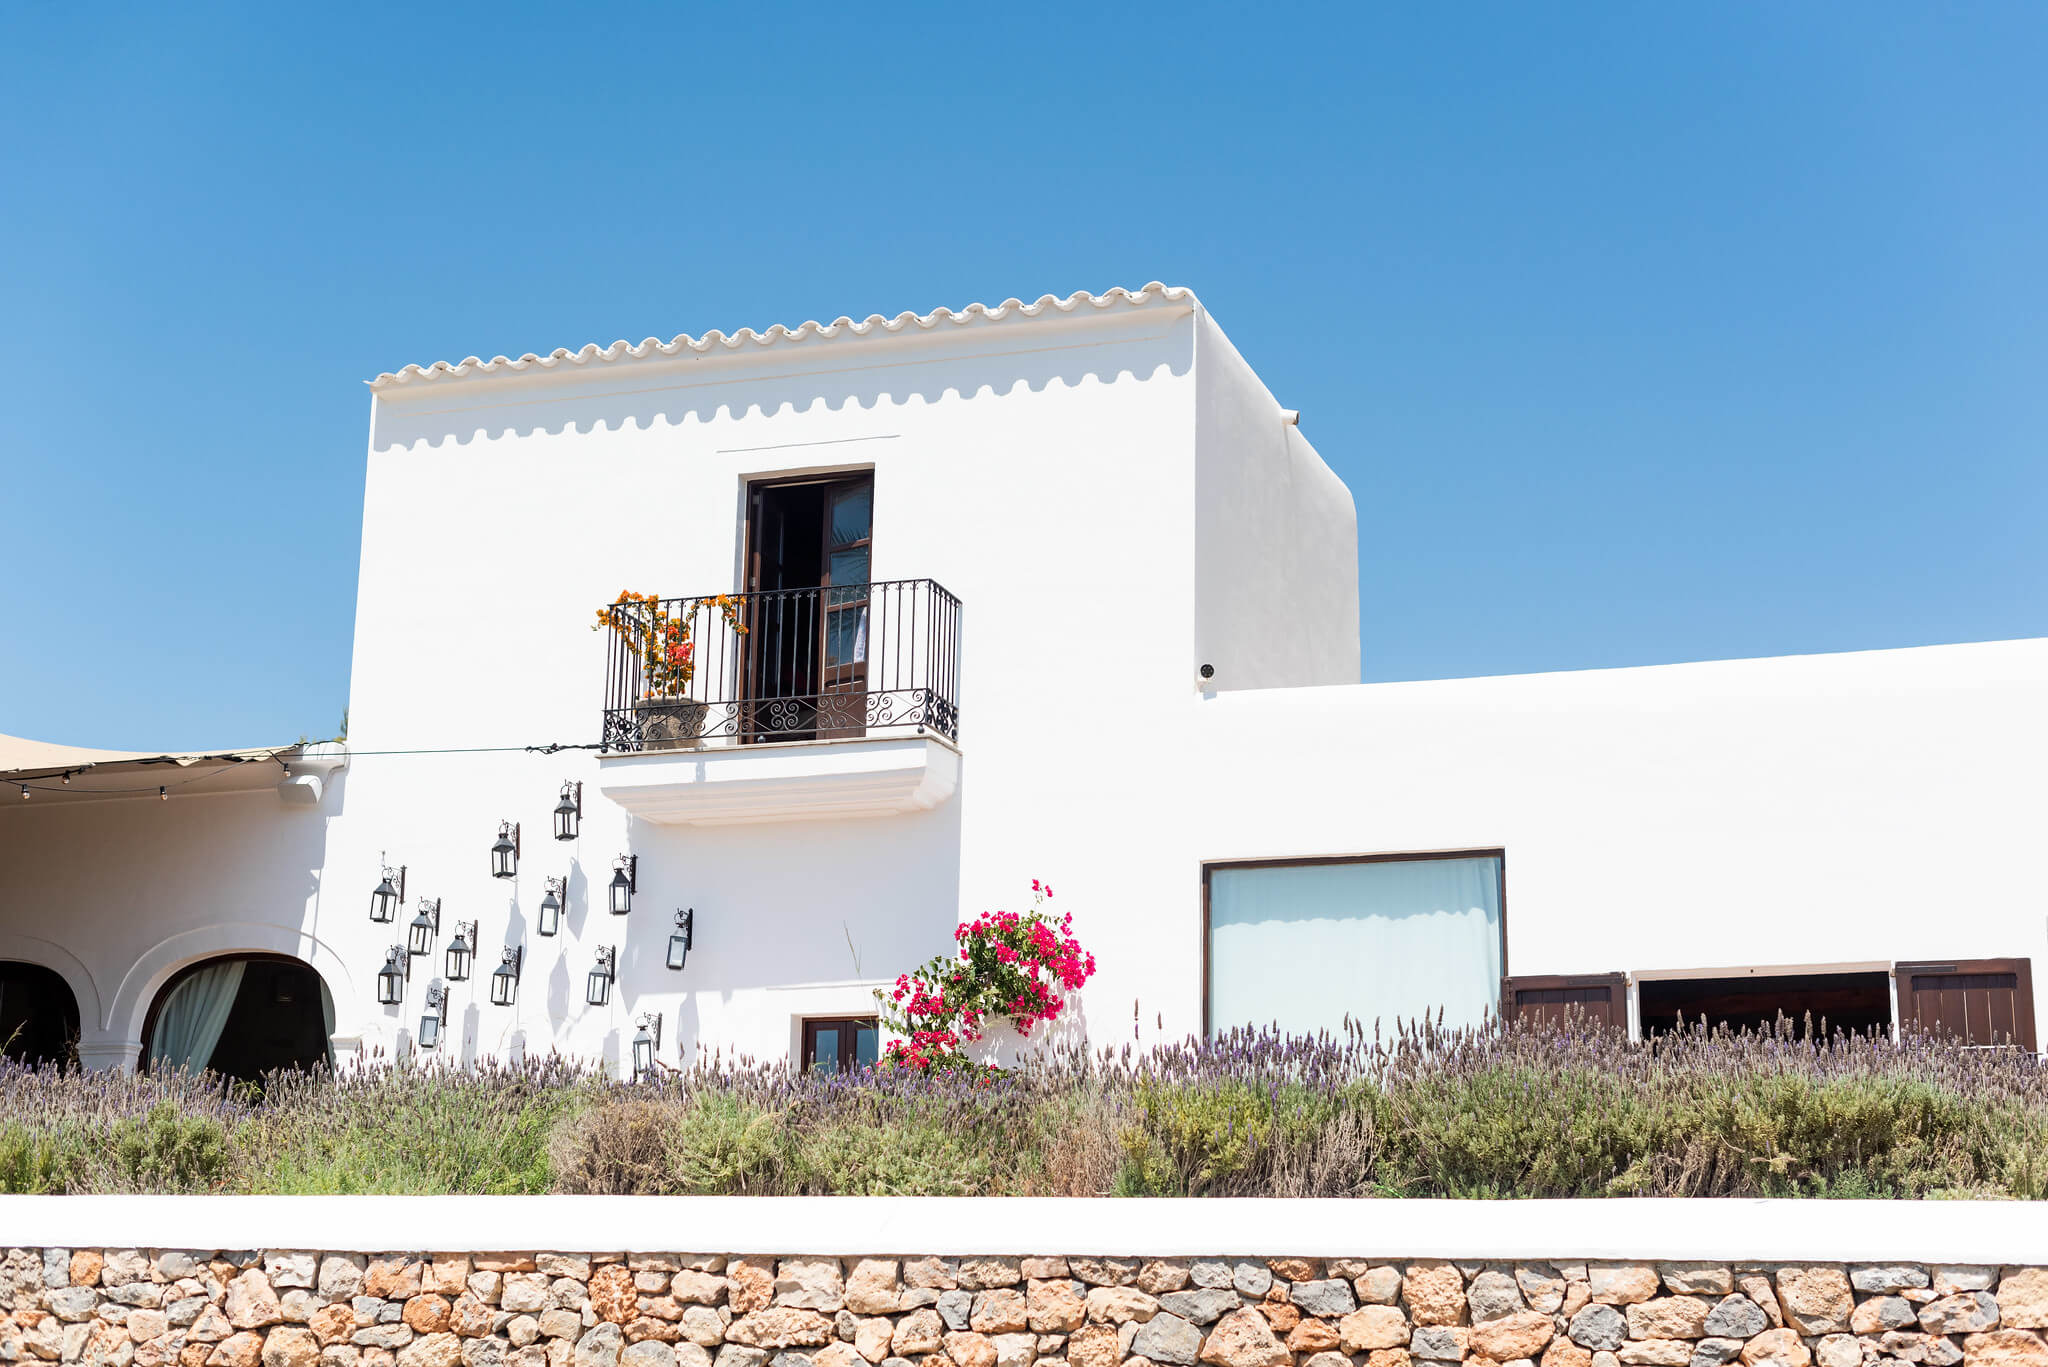 https://www.white-ibiza.com/wp-content/uploads/2020/03/white-ibiza-boutique-hotels-casa-maca-2020-06.jpg